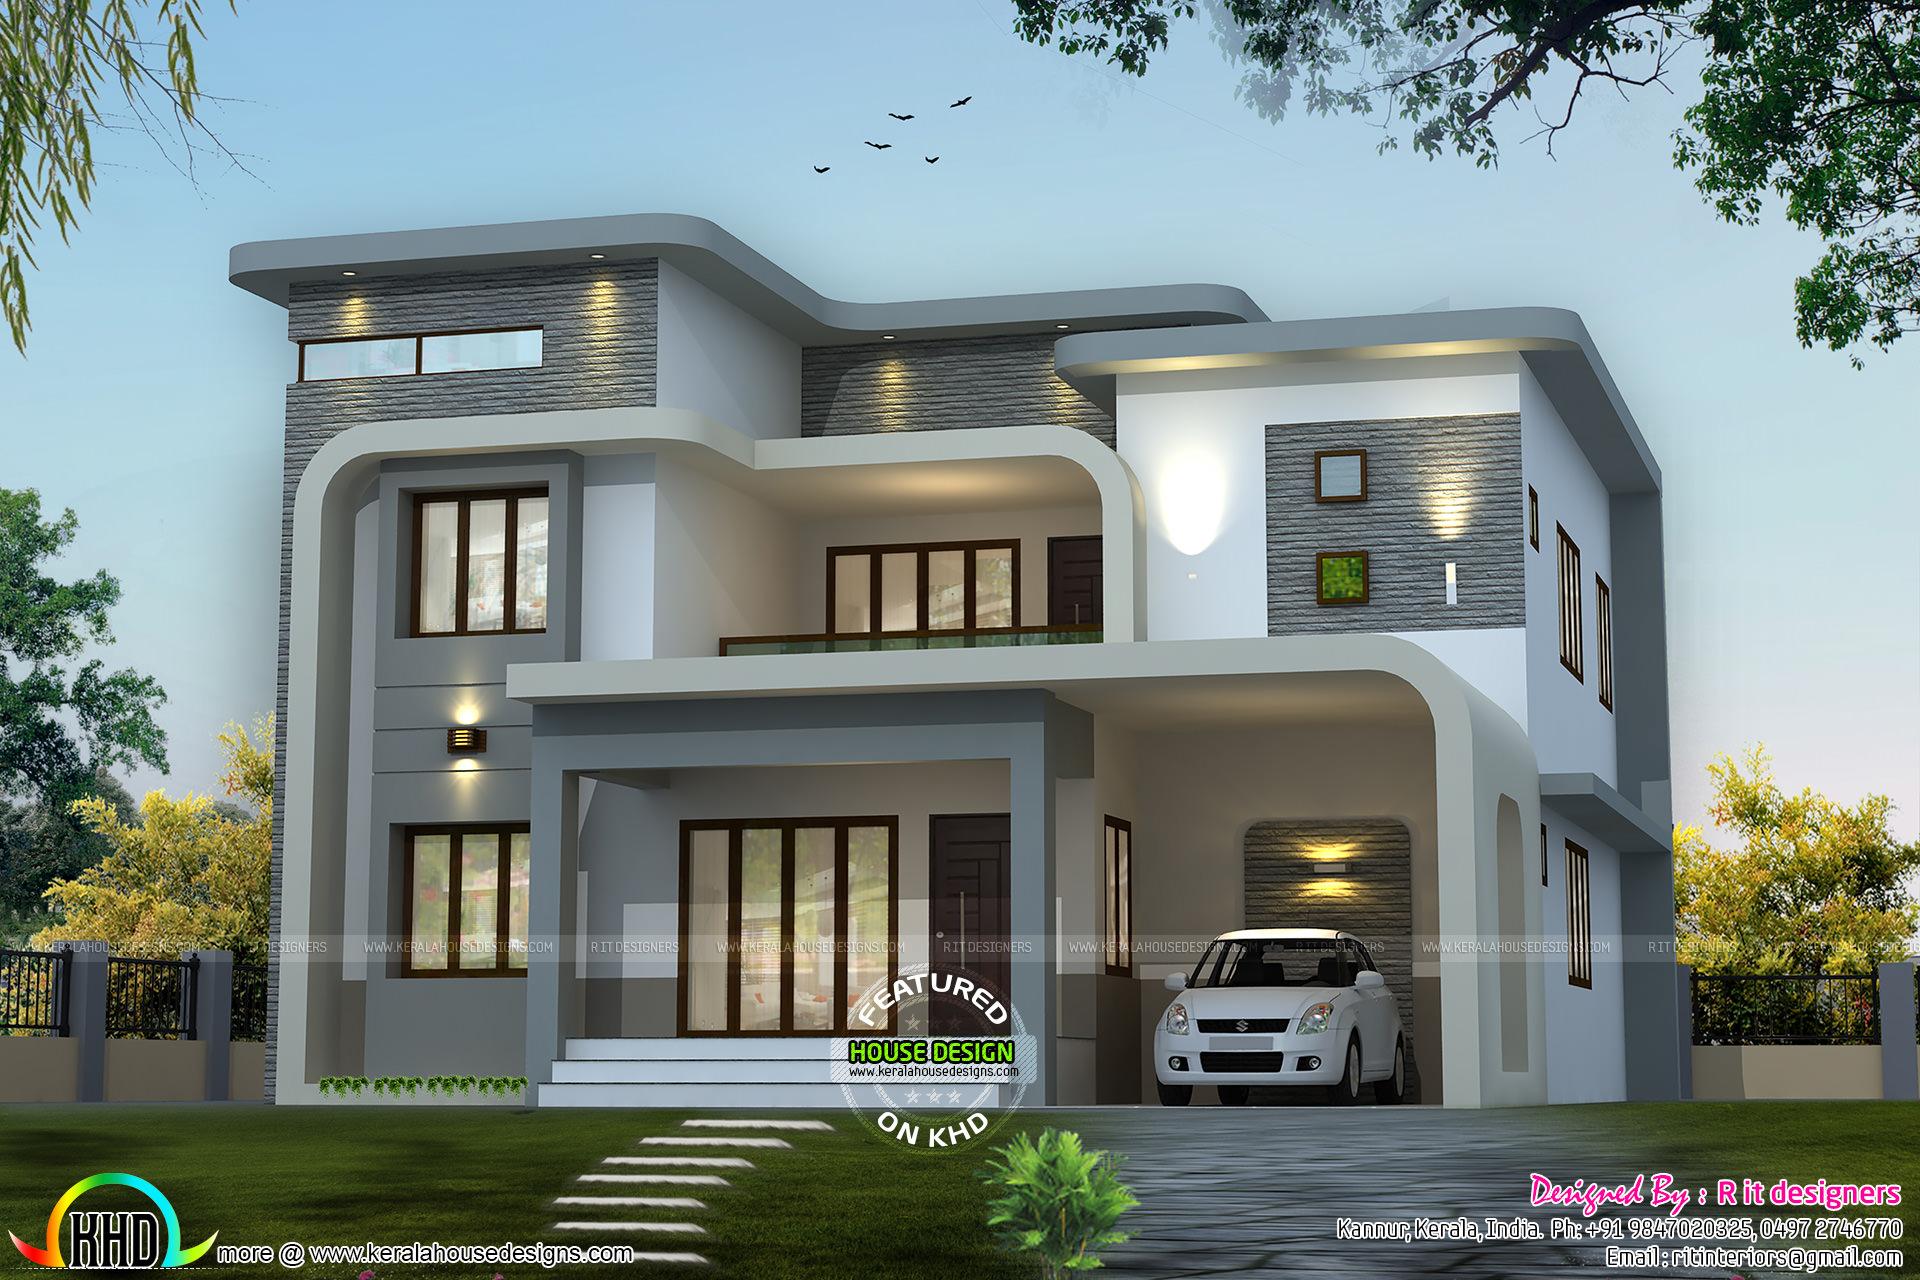 Unique flowing home design | Kerala home design | Bloglovin\'